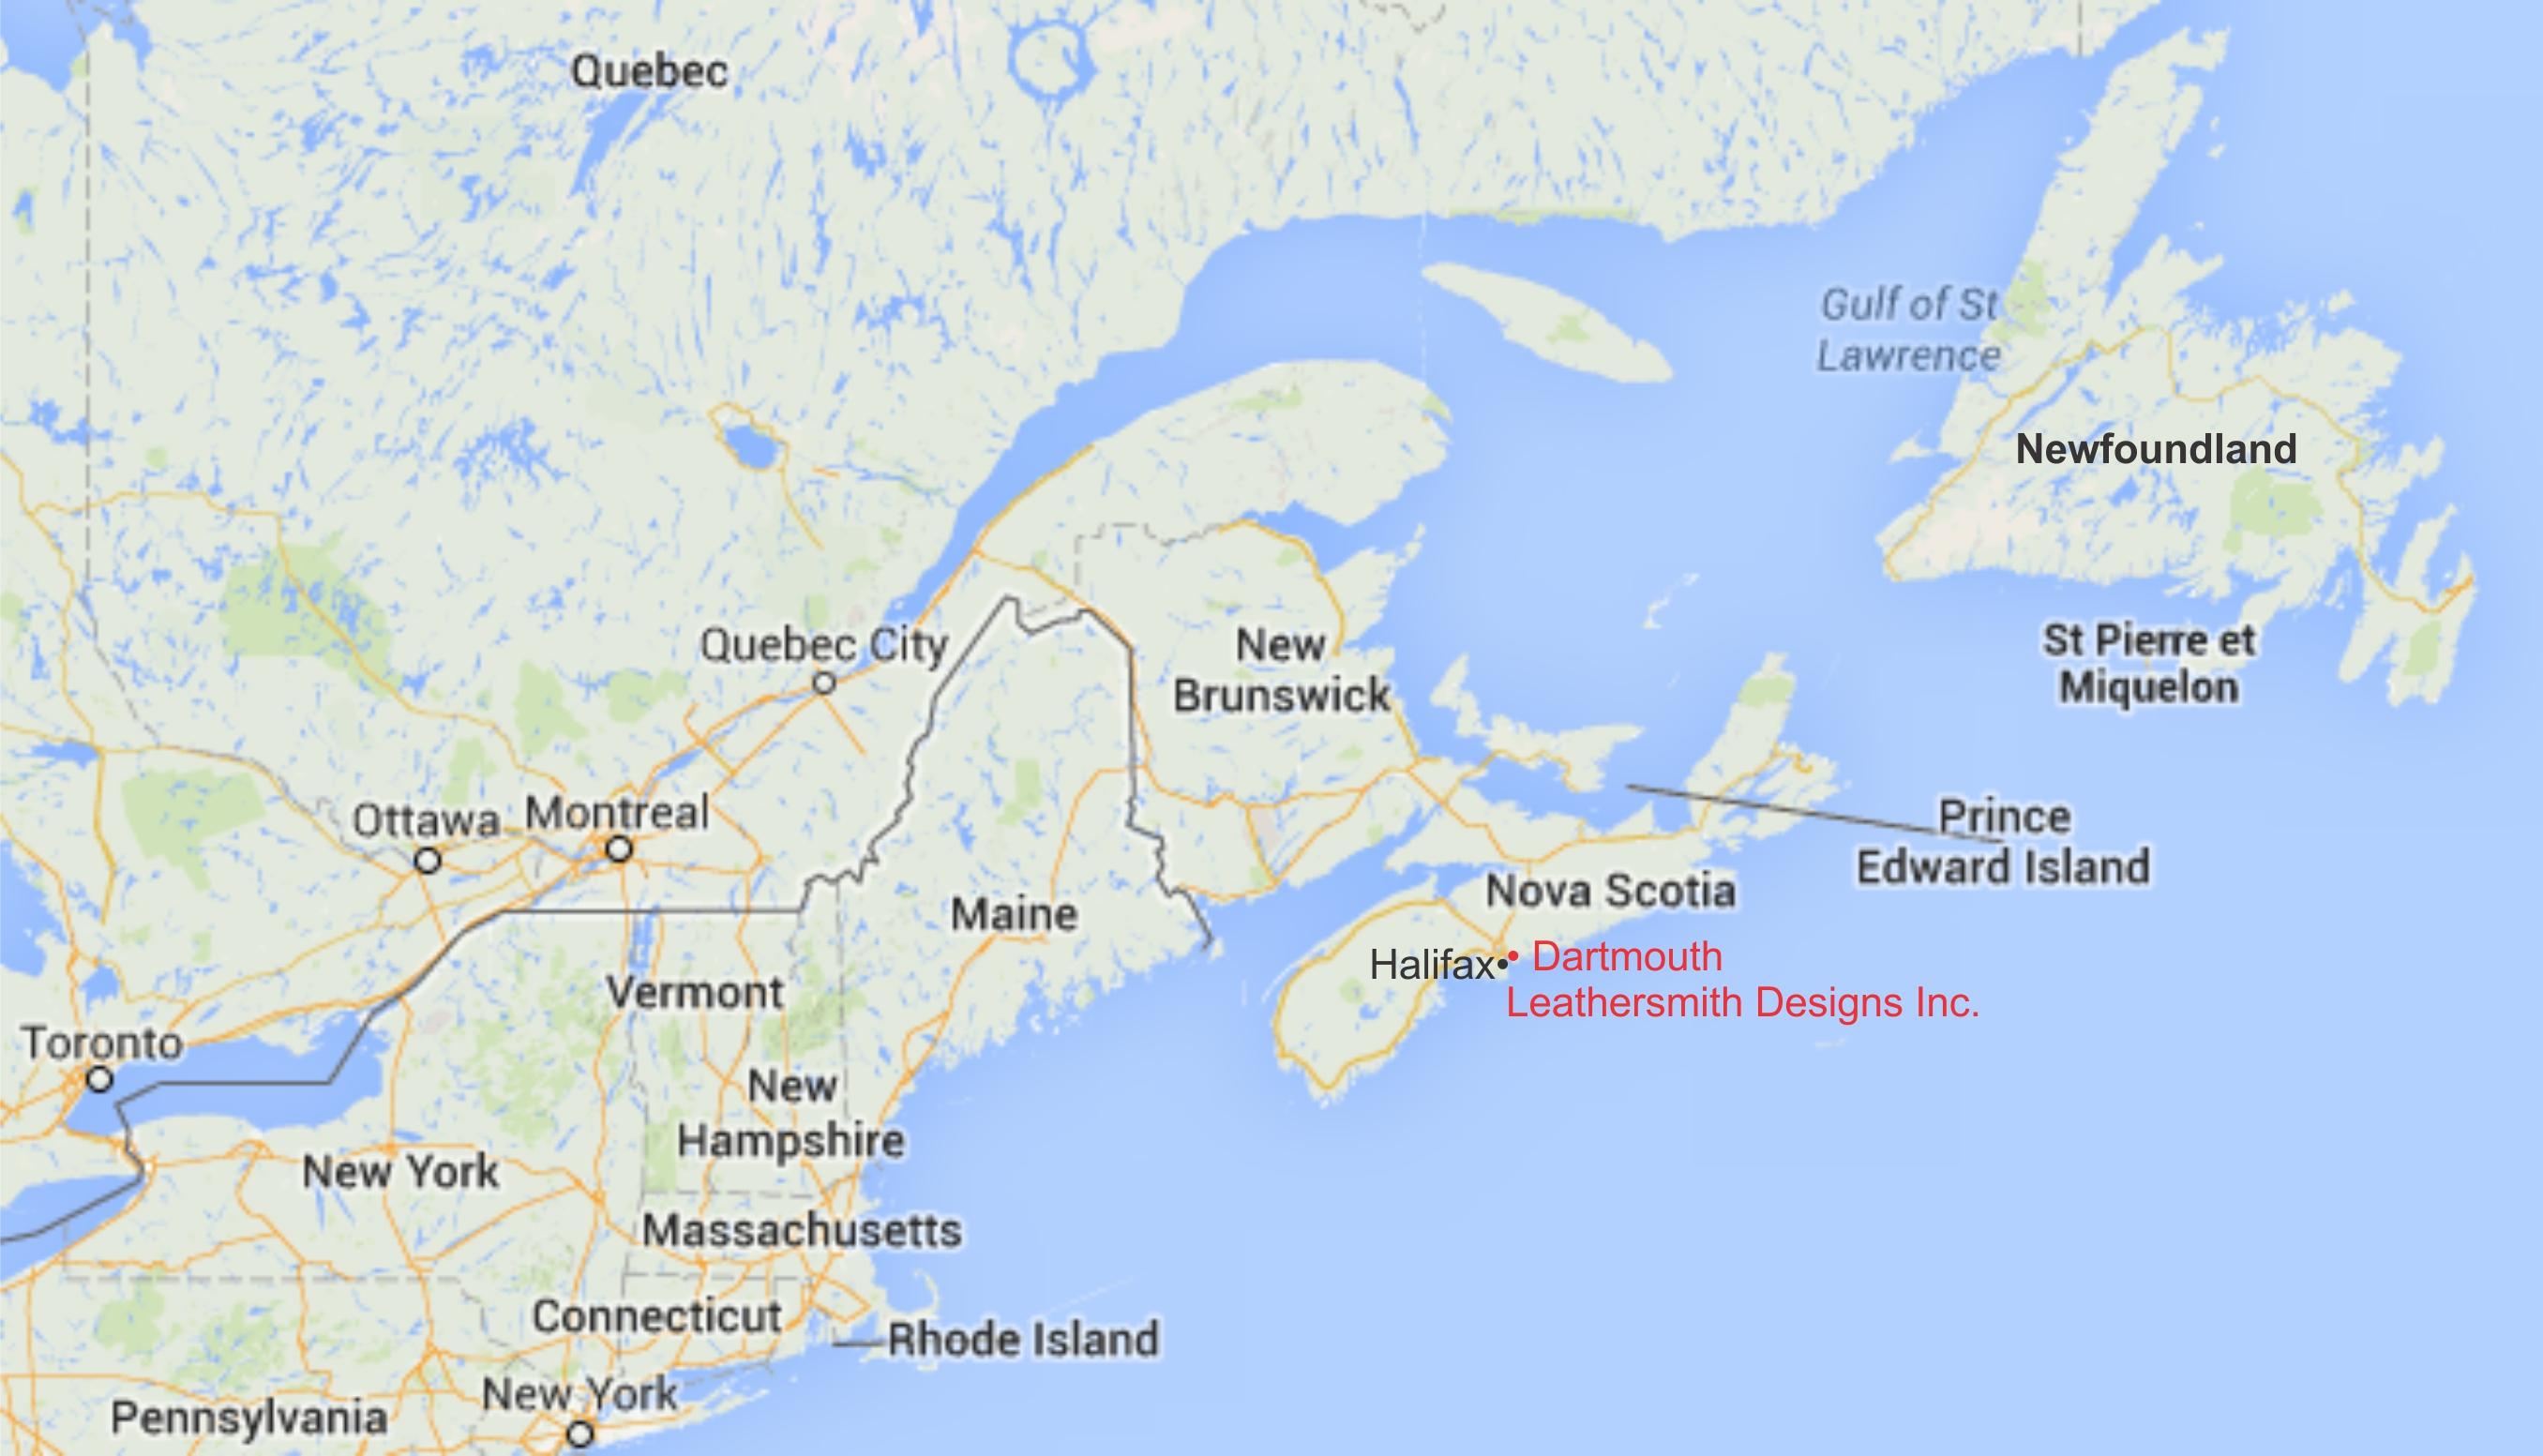 map-nova-scotia-canada-maine-united-states.jpg